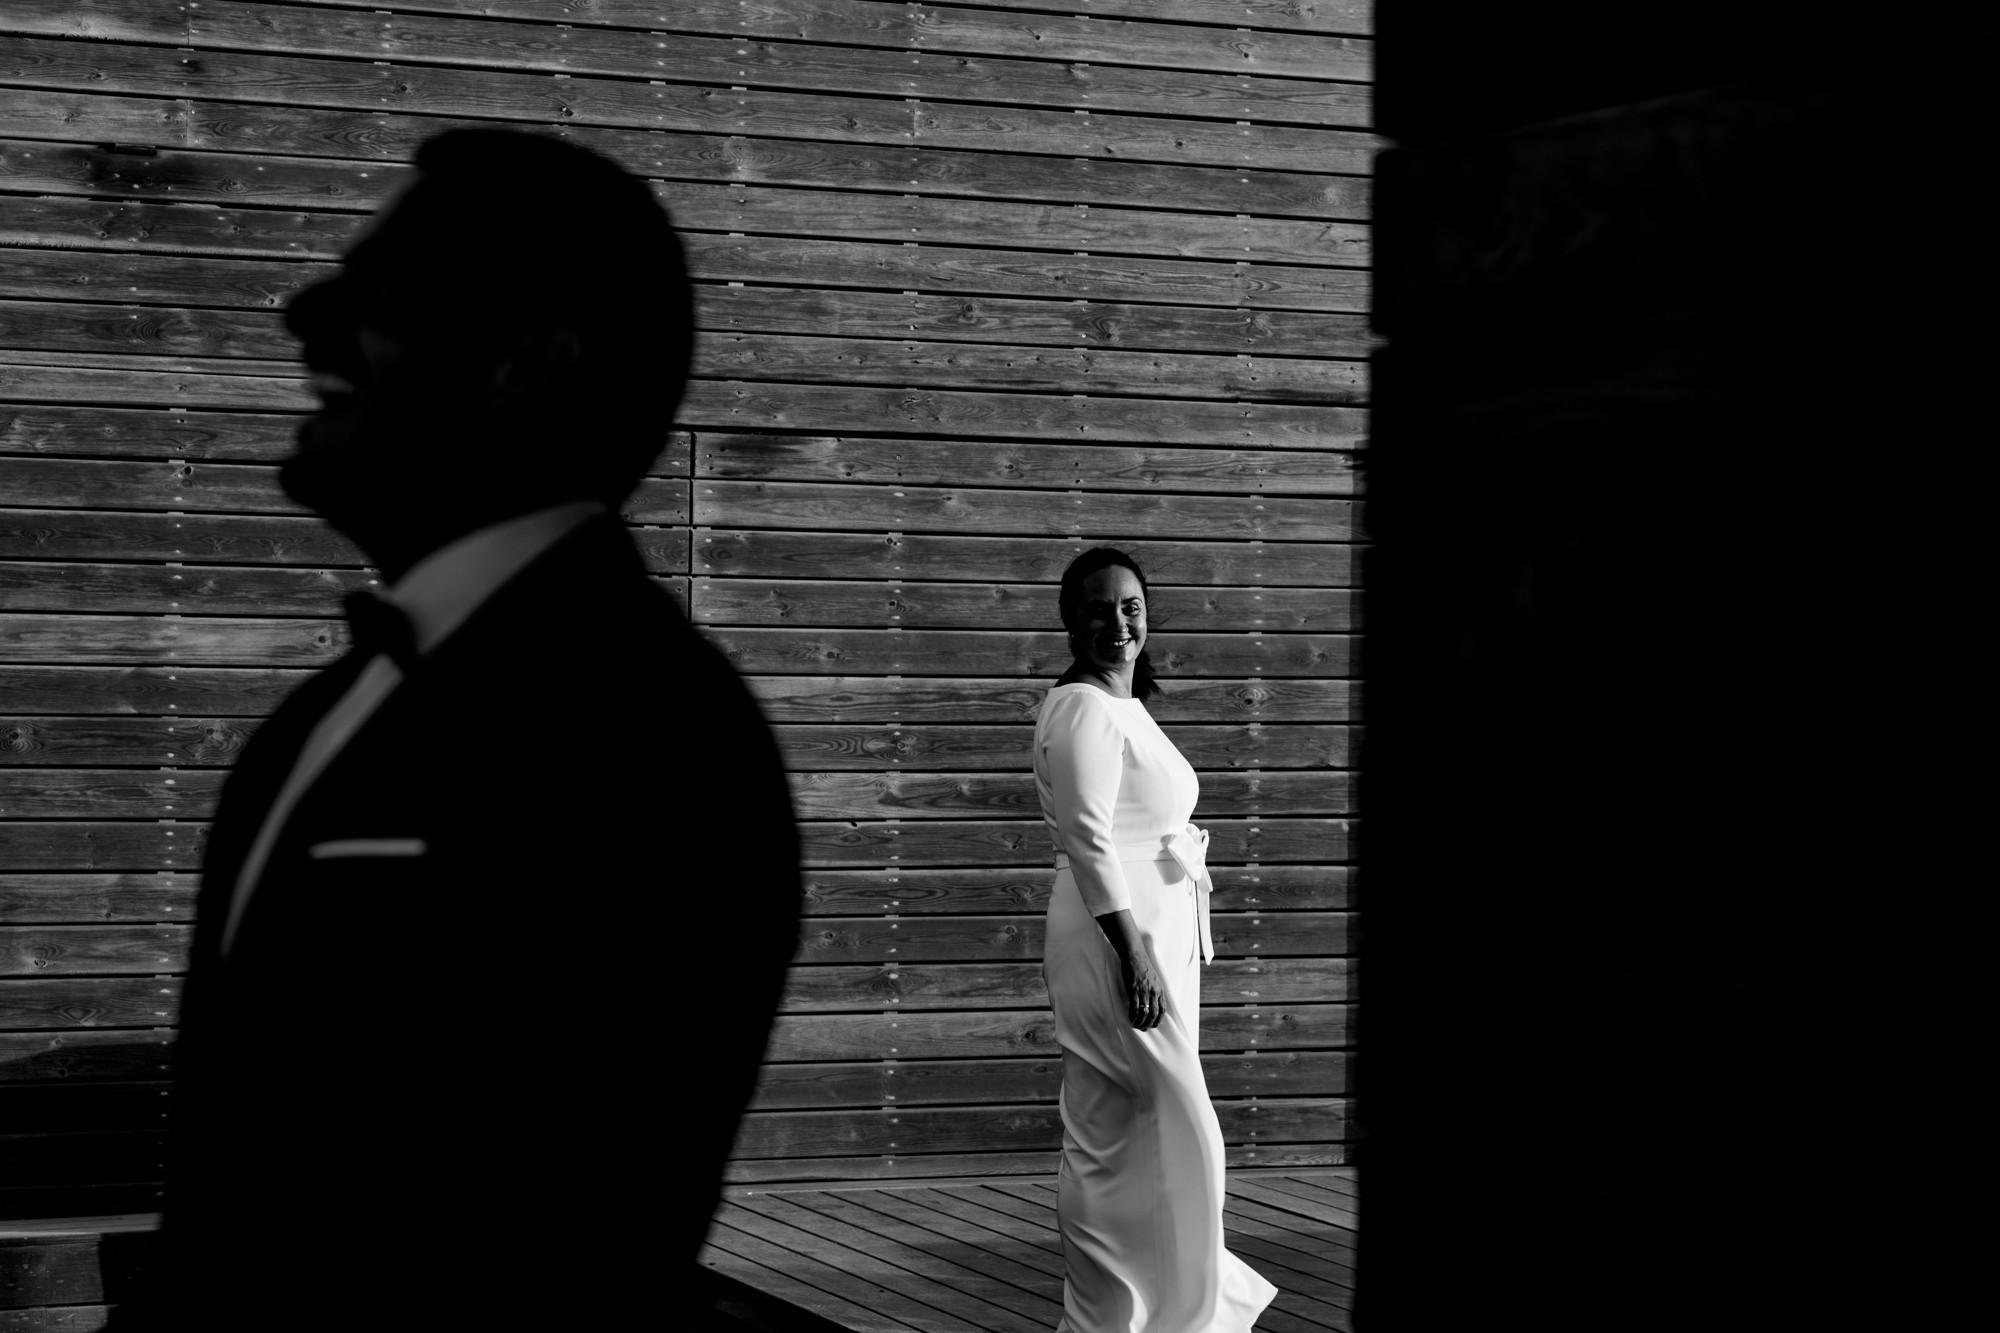 boda fuerteventura fotografo profesional 02